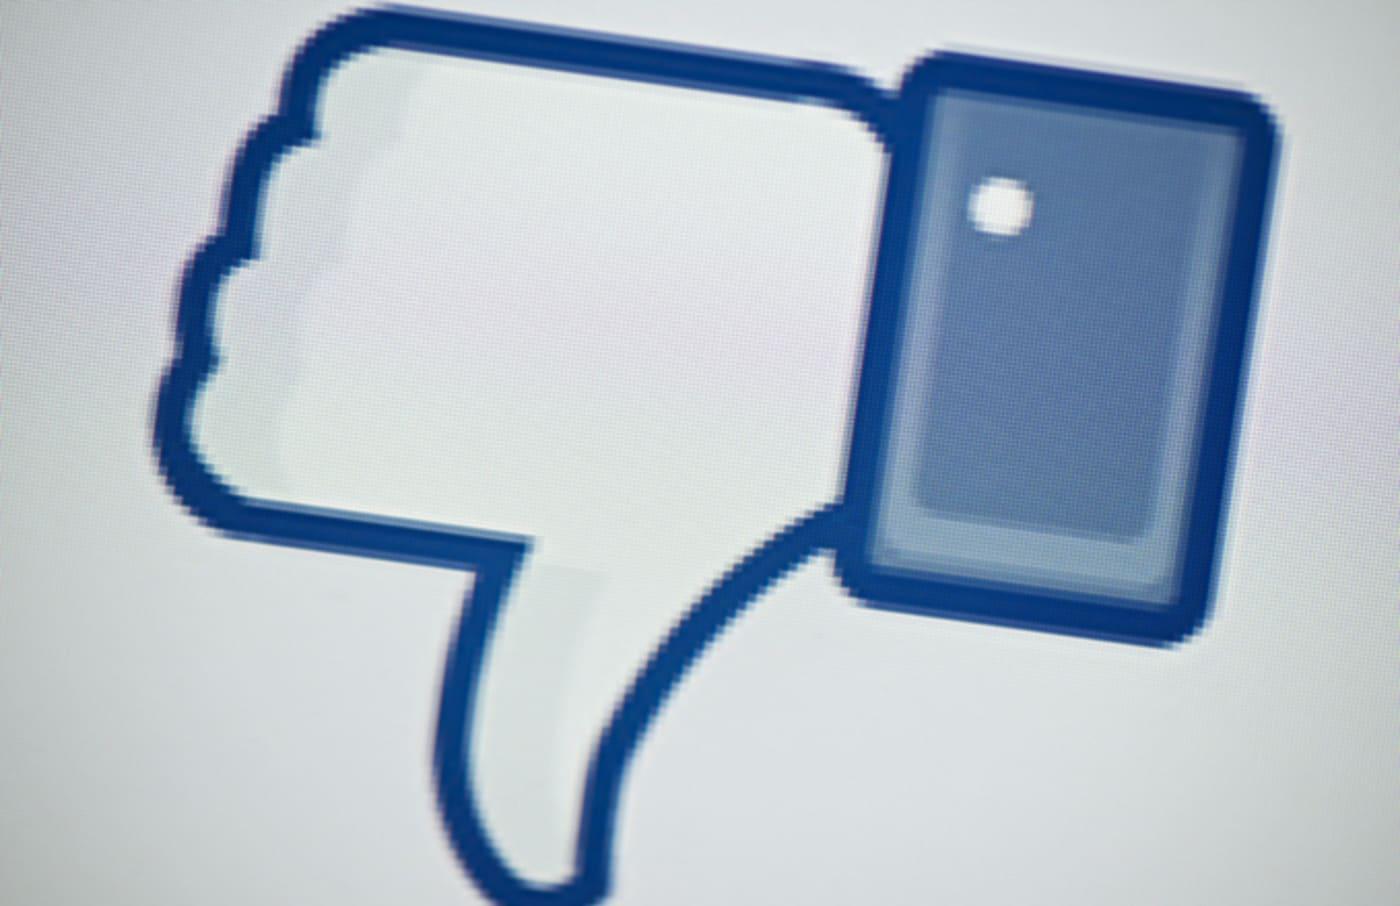 facebook downvote button getty